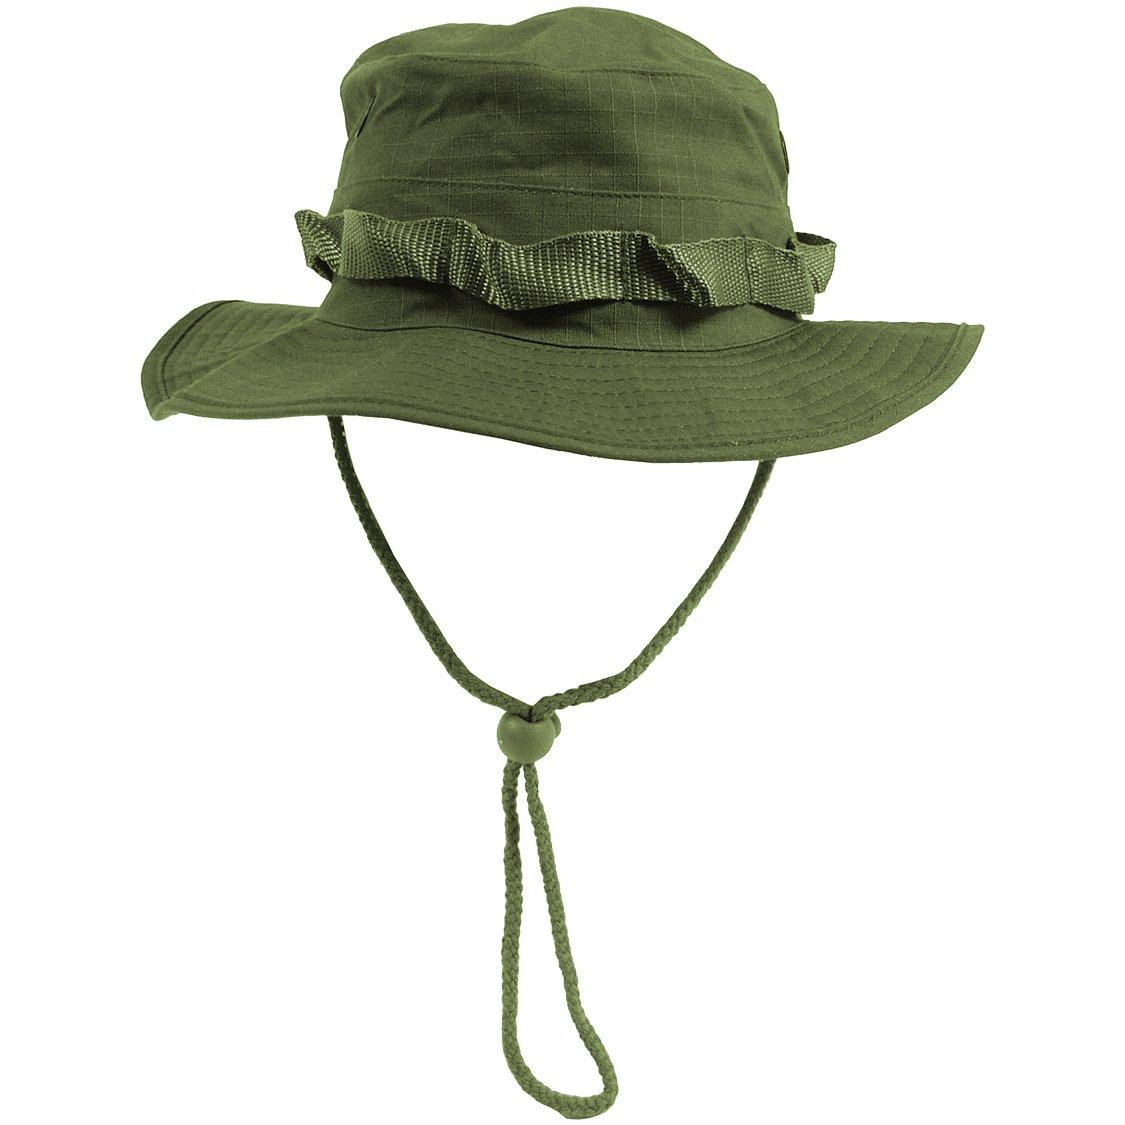 MFH GI Ripstop Bush Hat Olive